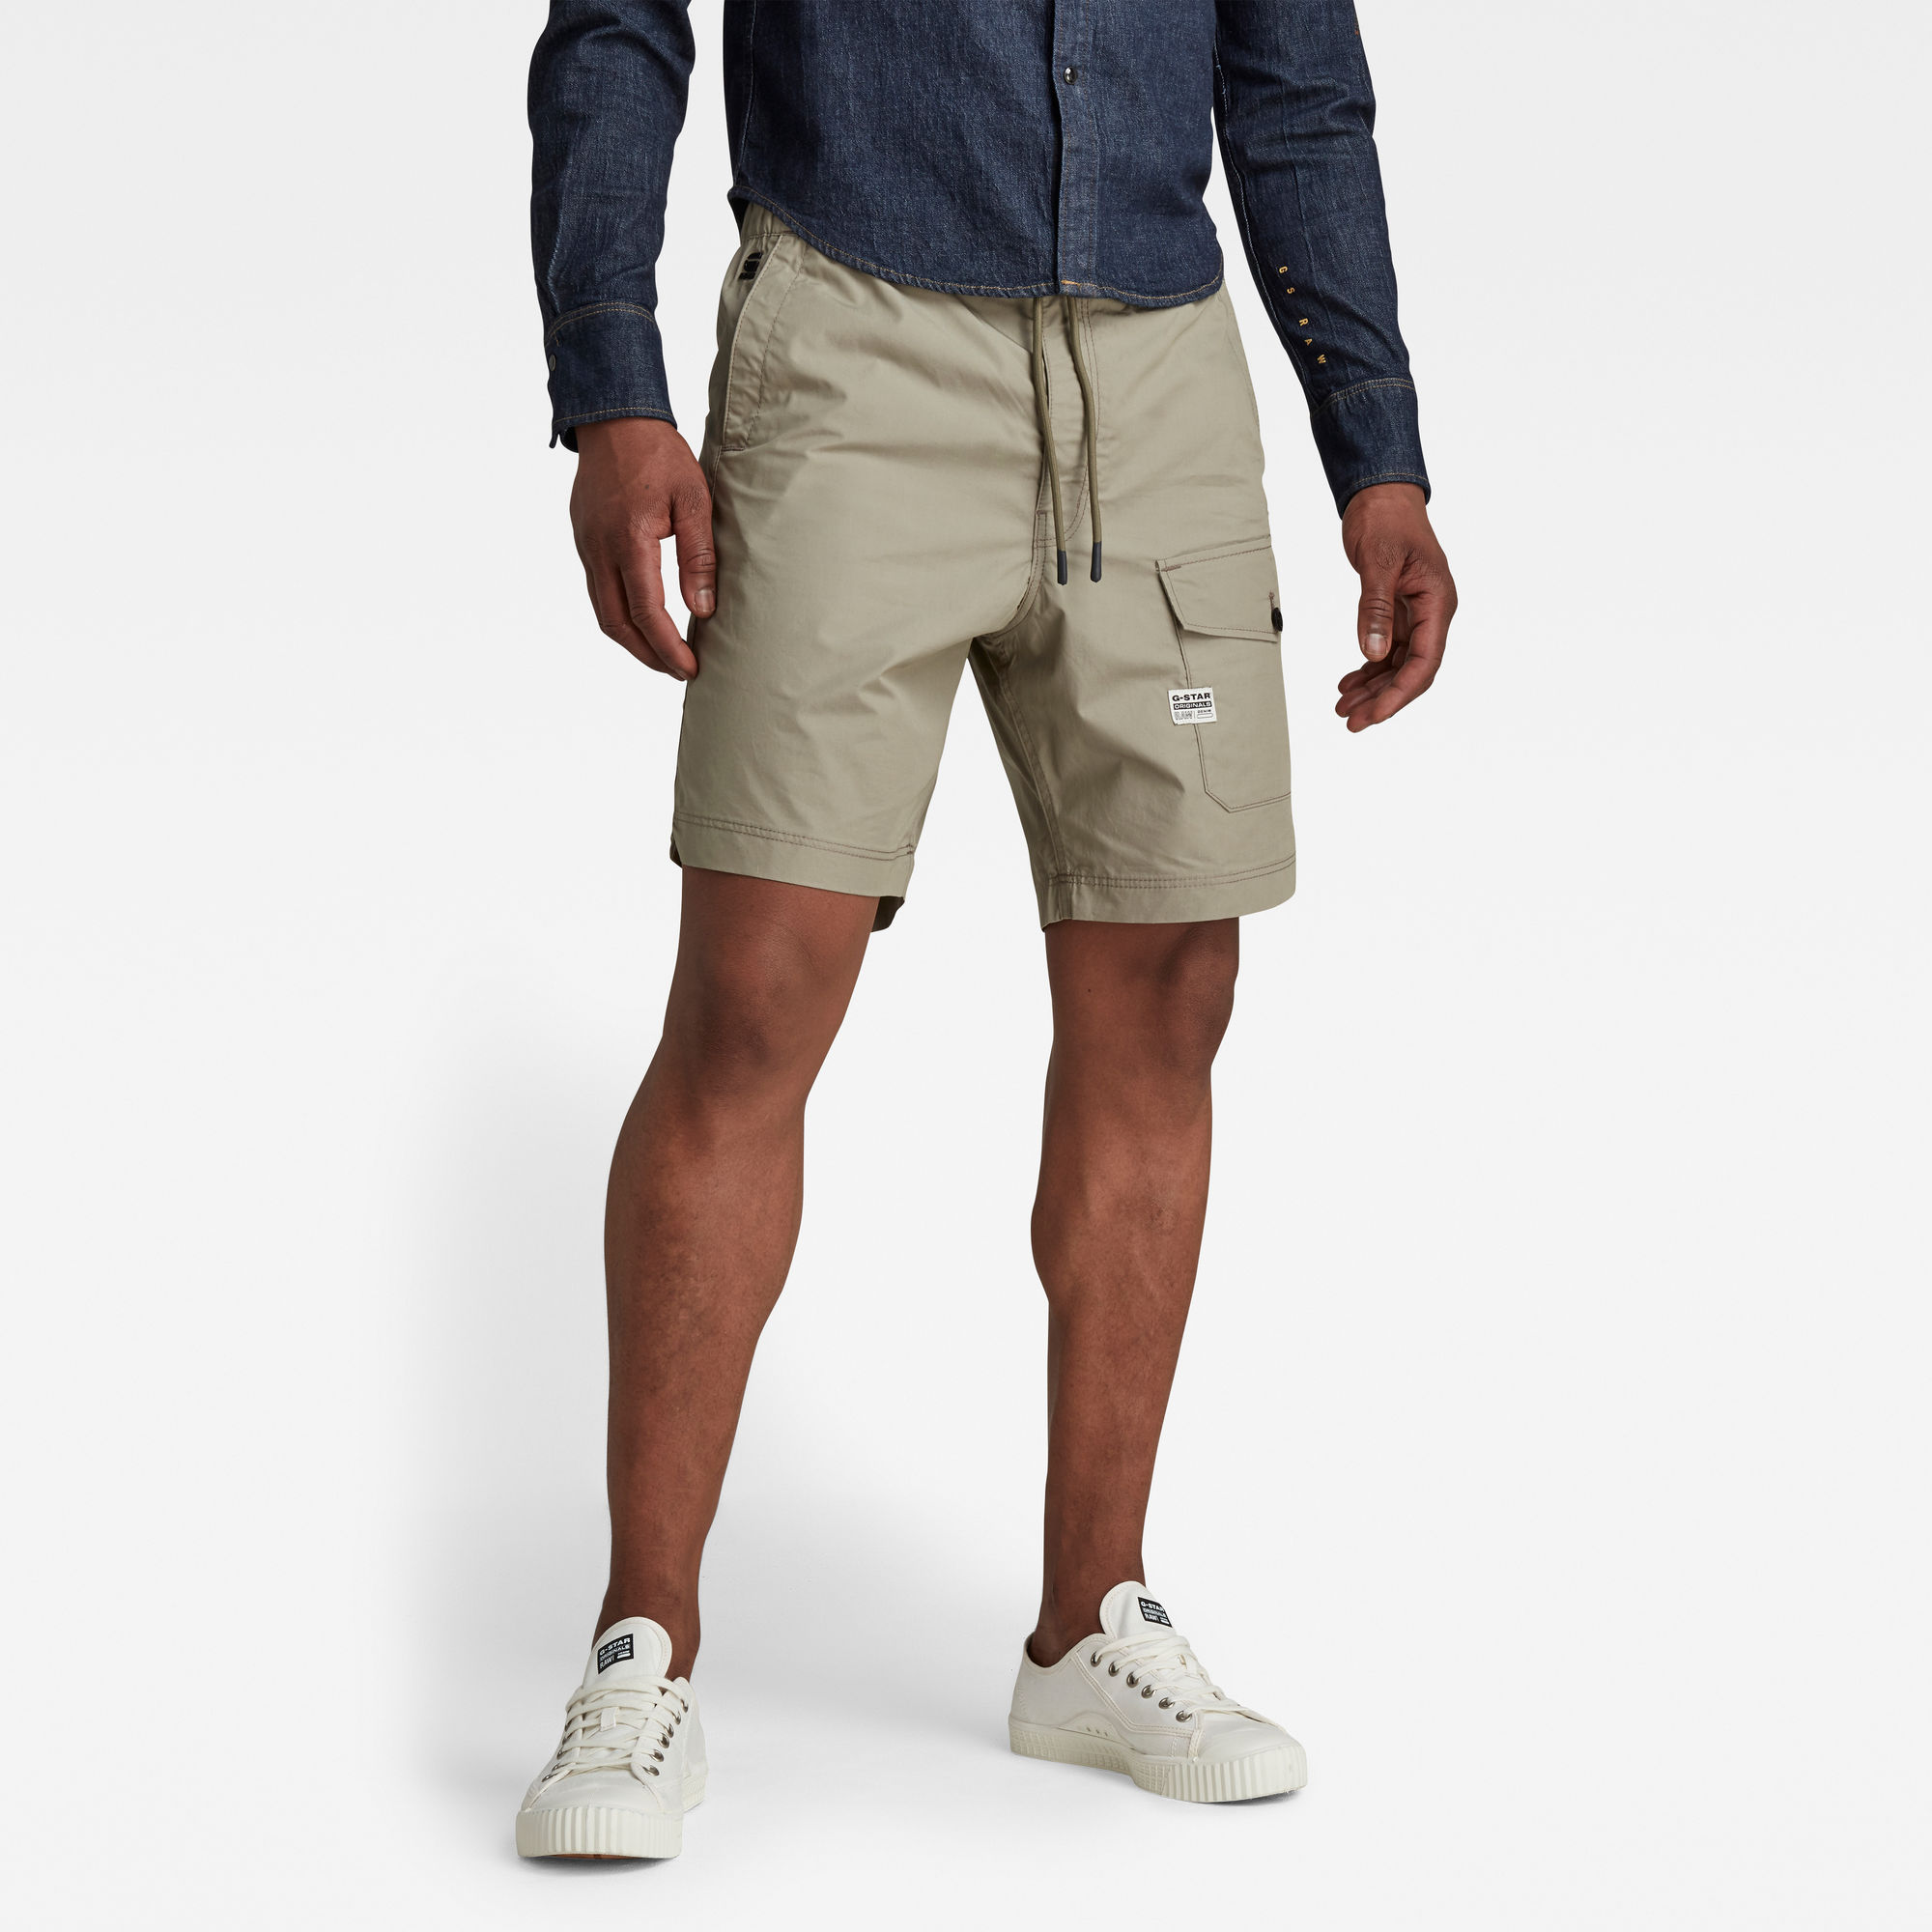 G-Star RAW Heren Front Pocket Sport Short Groen